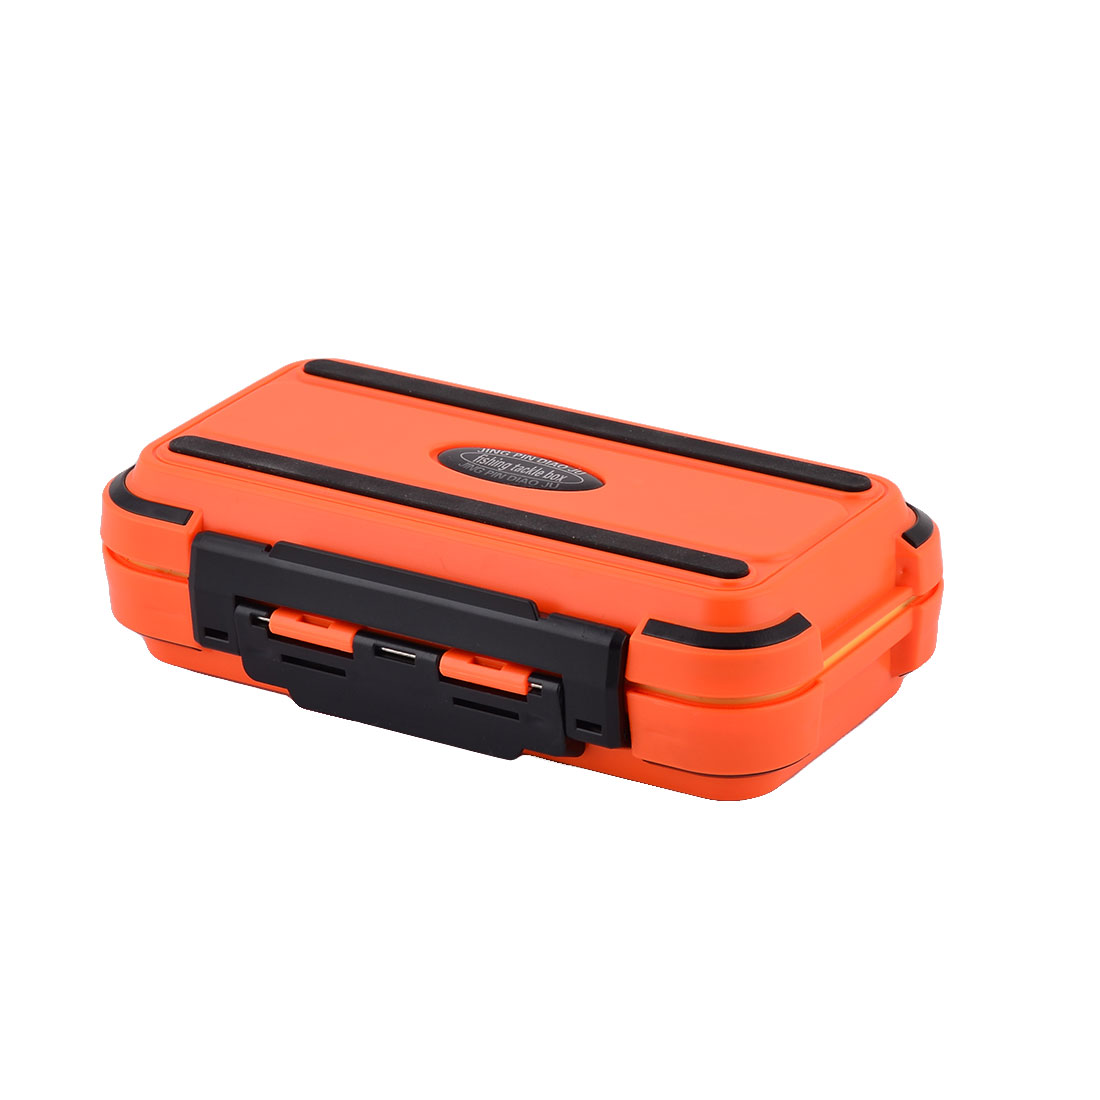 Plastic Fishing 24 Compartments Fish Hook Bait Storage Box Case Fishhook Holder Orange